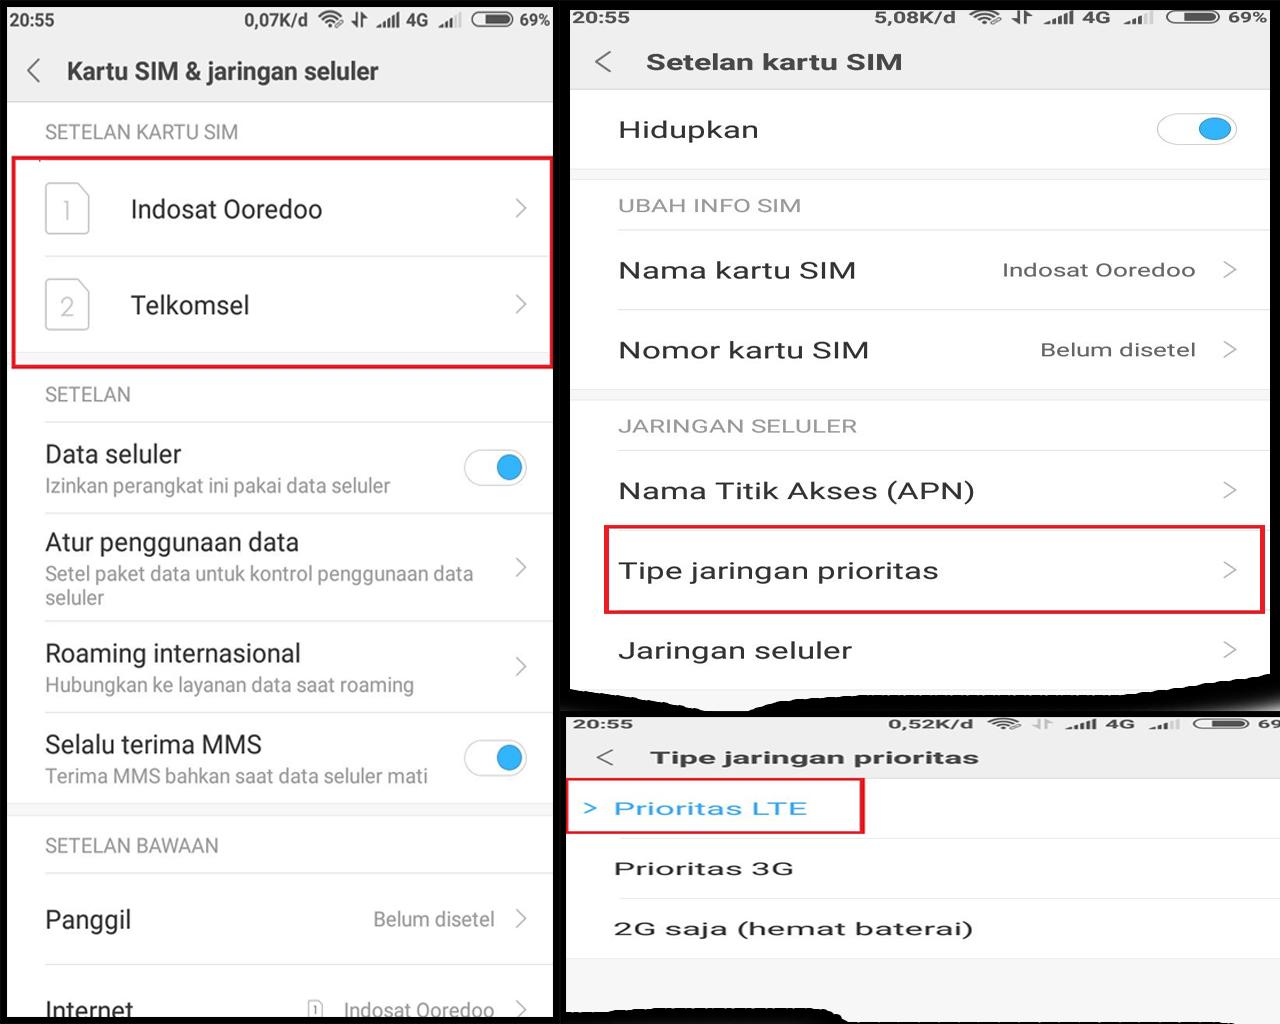 Cara Mengaktifkan Sinyal 4g Lte Only Di Xiaomi Redmi Note 5a Prime